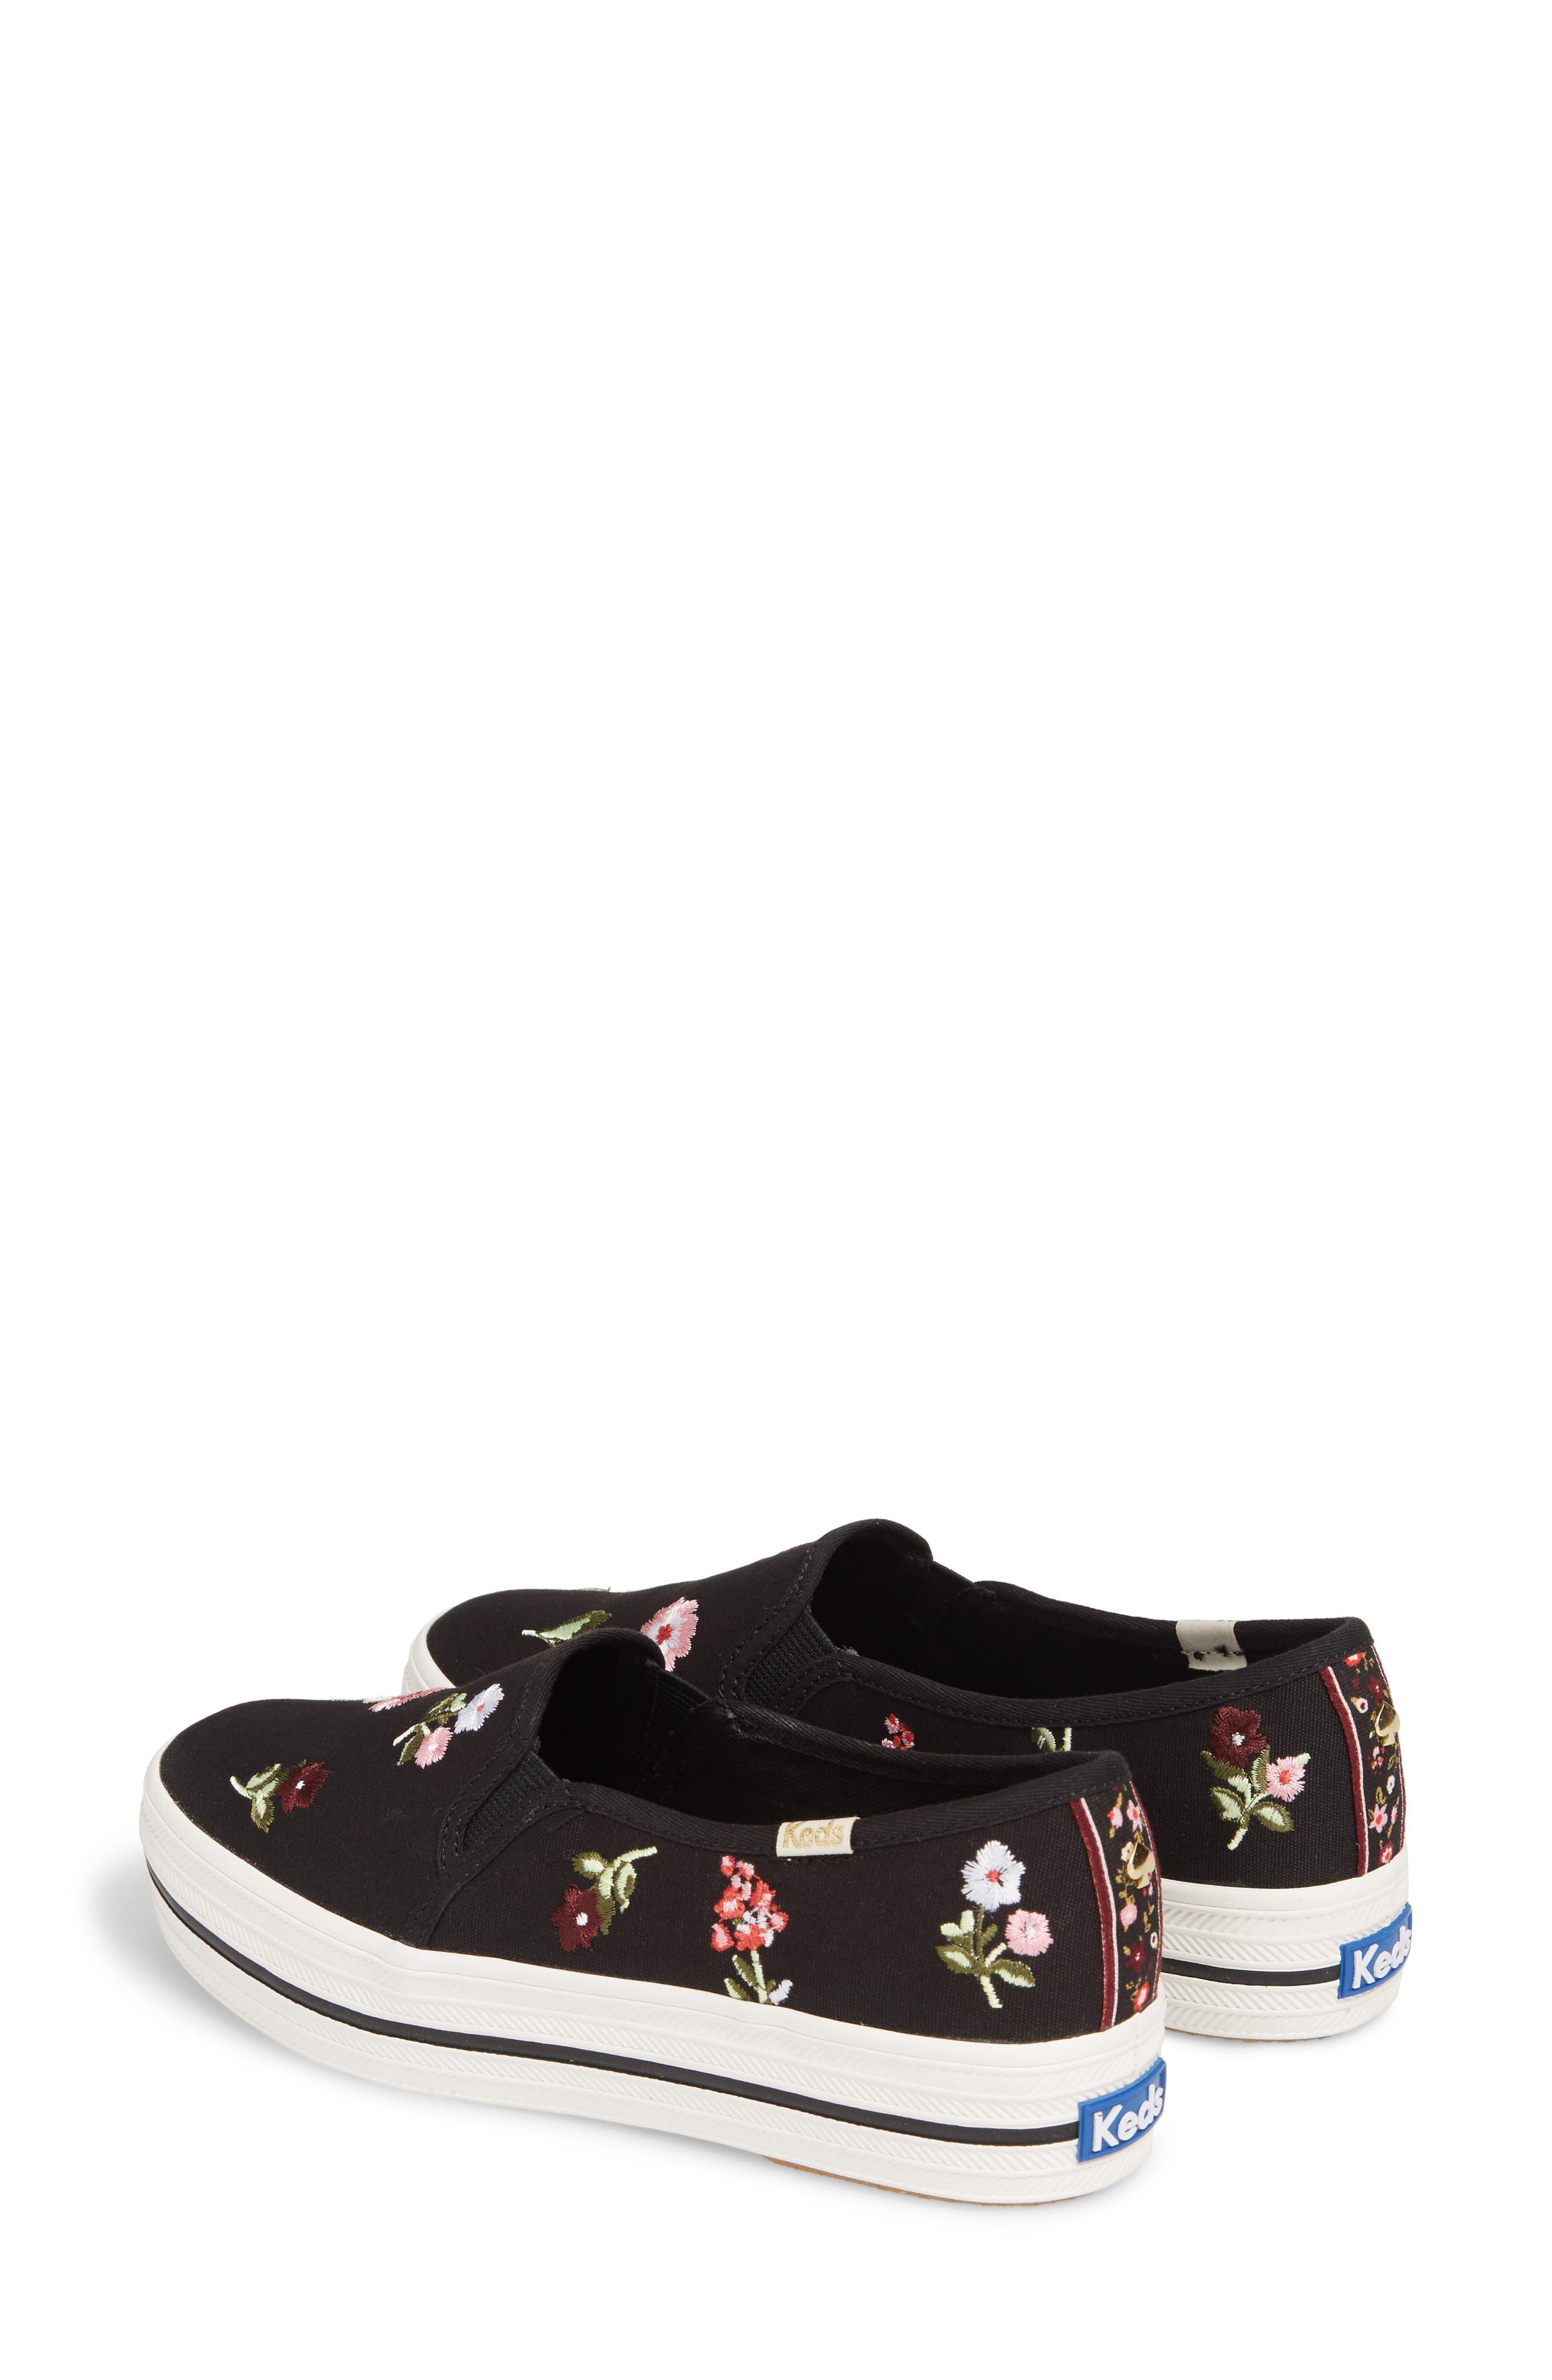 Keds<sup>®</sup> x kate spade Triple Decker Slip-On Sneaker,                             Alternate thumbnail 4, color,